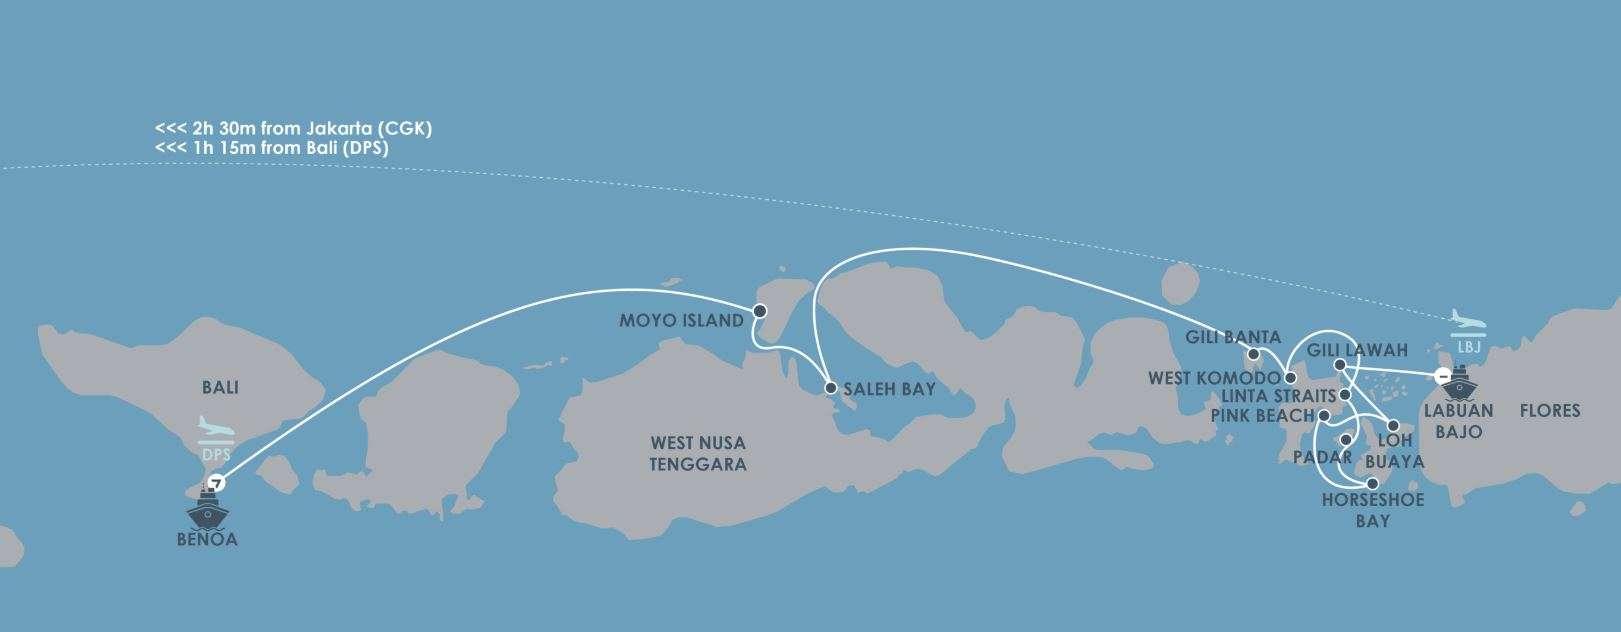 Bali to Komodo National Park on a world class yacht | Calgary Adventure Travel & Luxury Tours